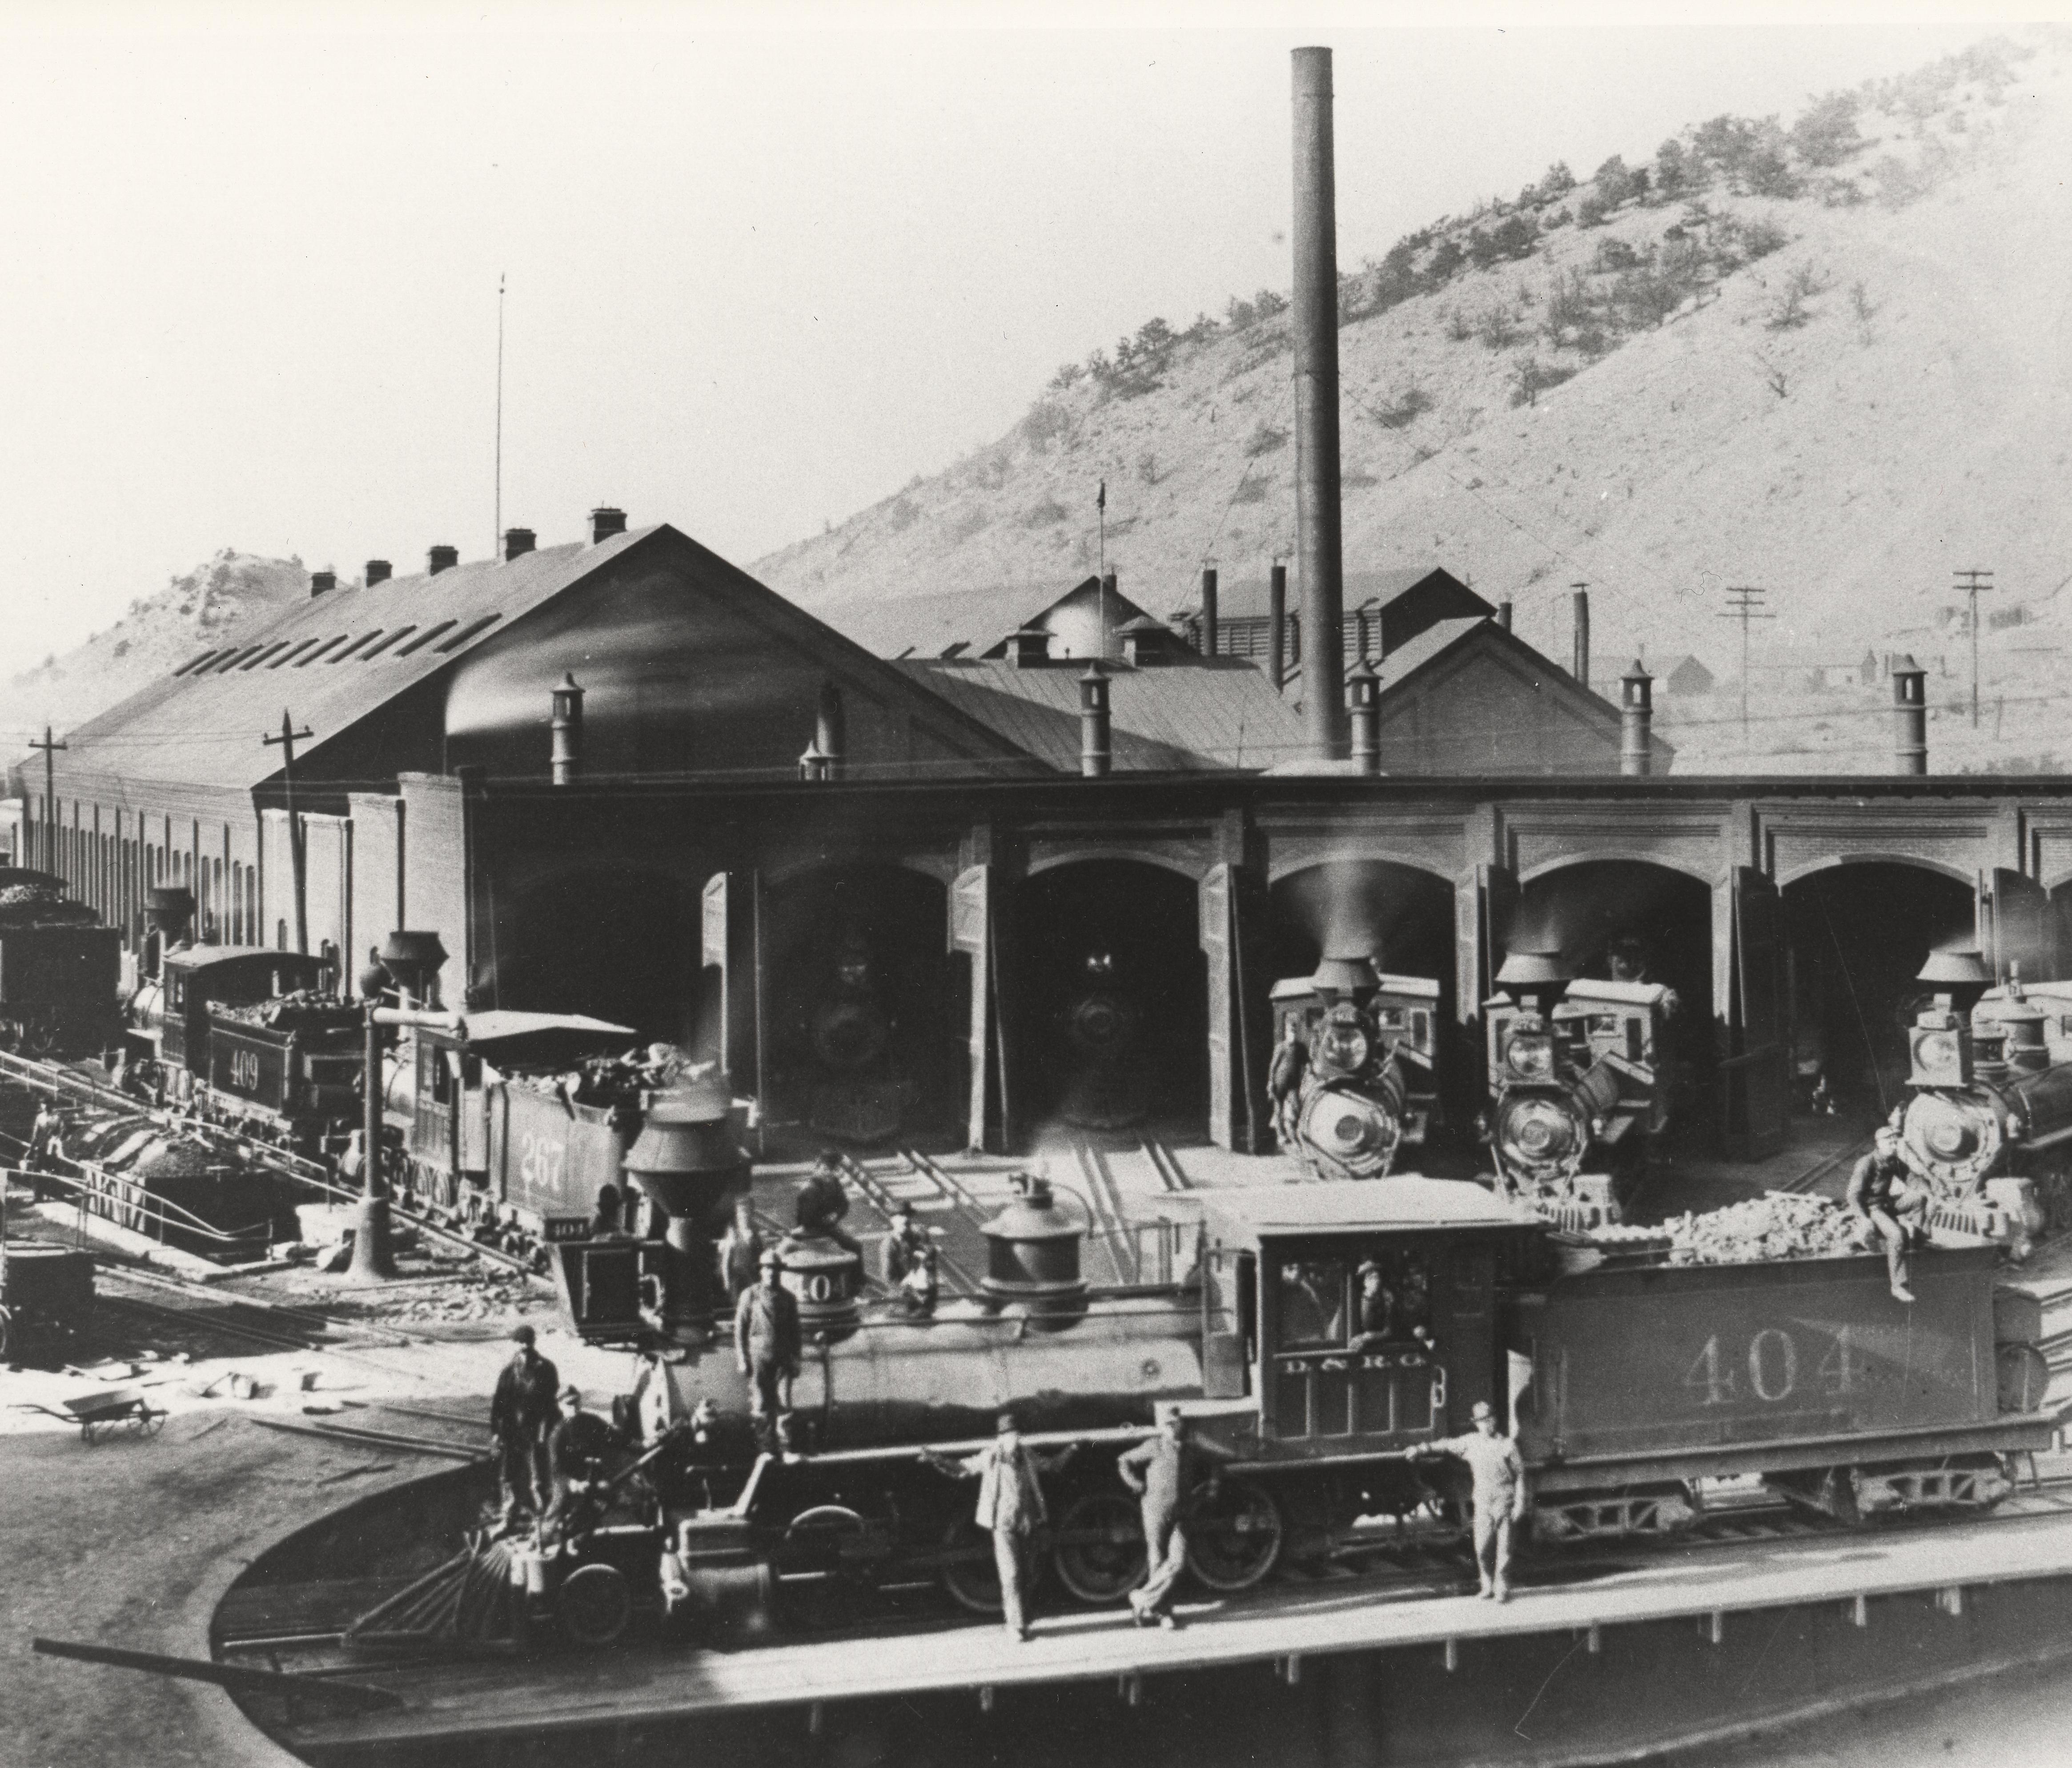 Denver & Rio Grande Western Railroad